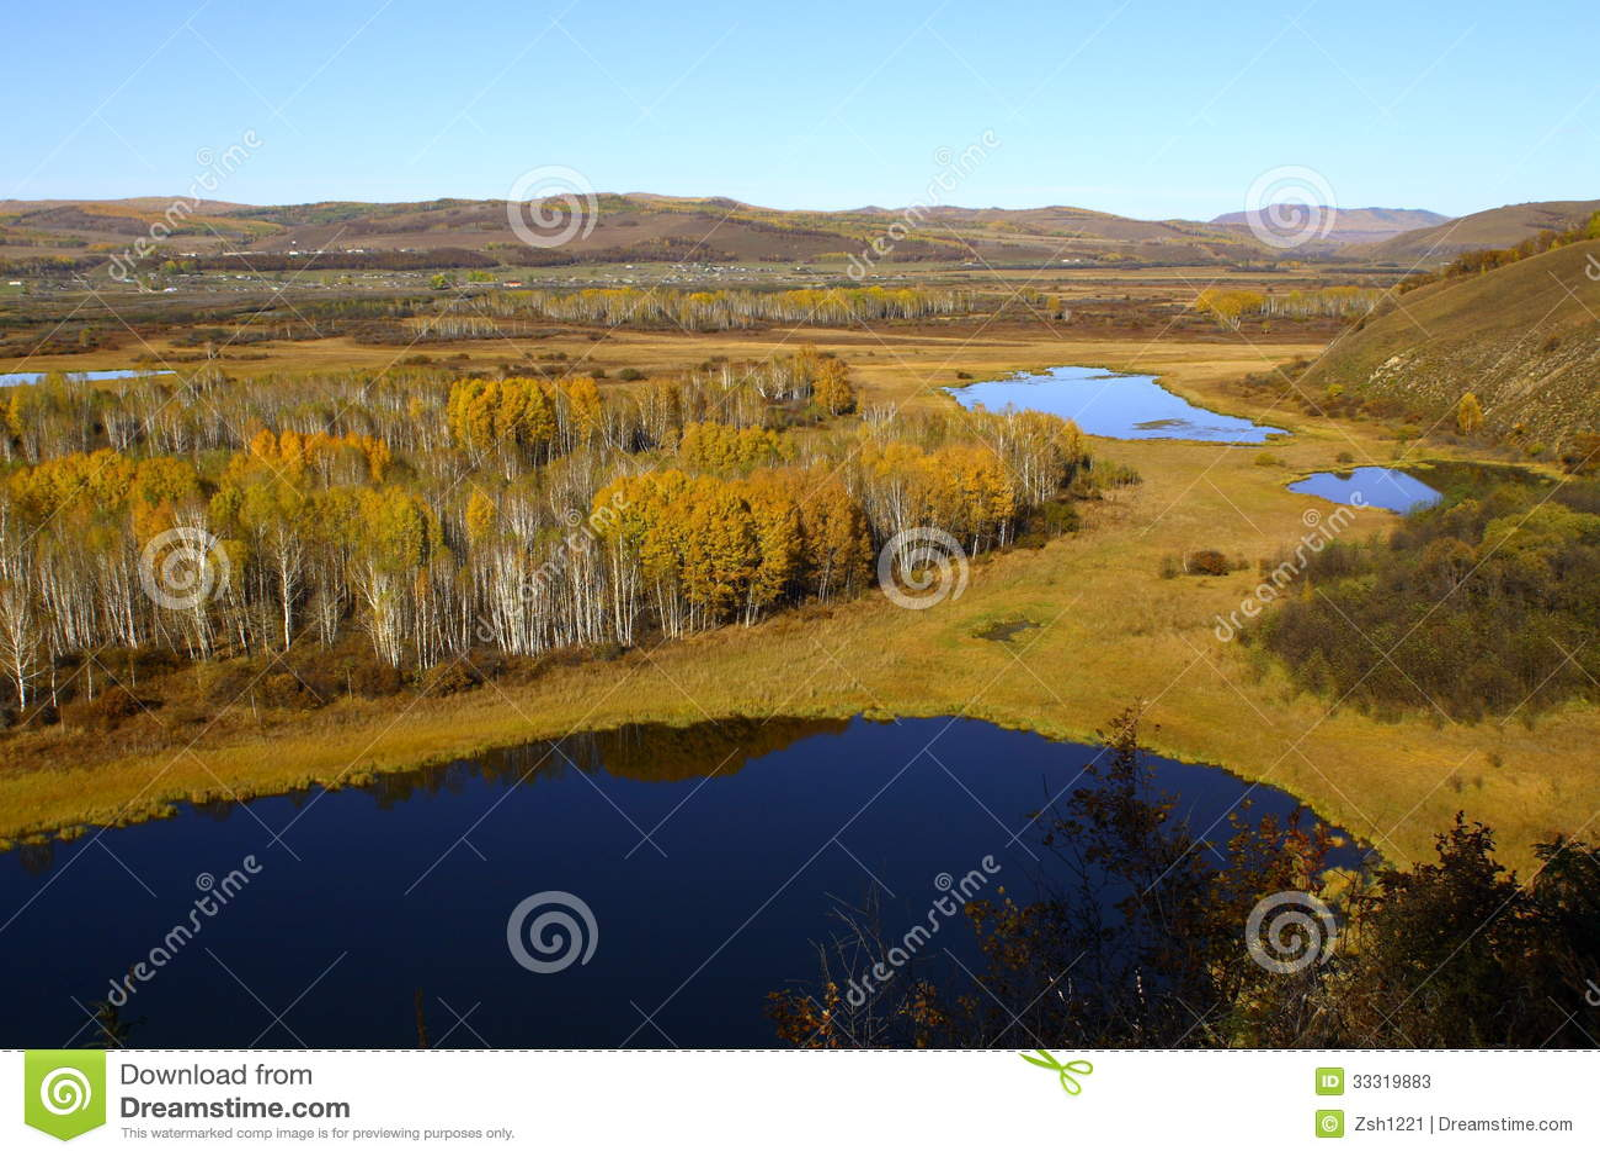 Hulun Buir China  city photo : Inner Mongolia Grassland Stock Photos Image: 33319883